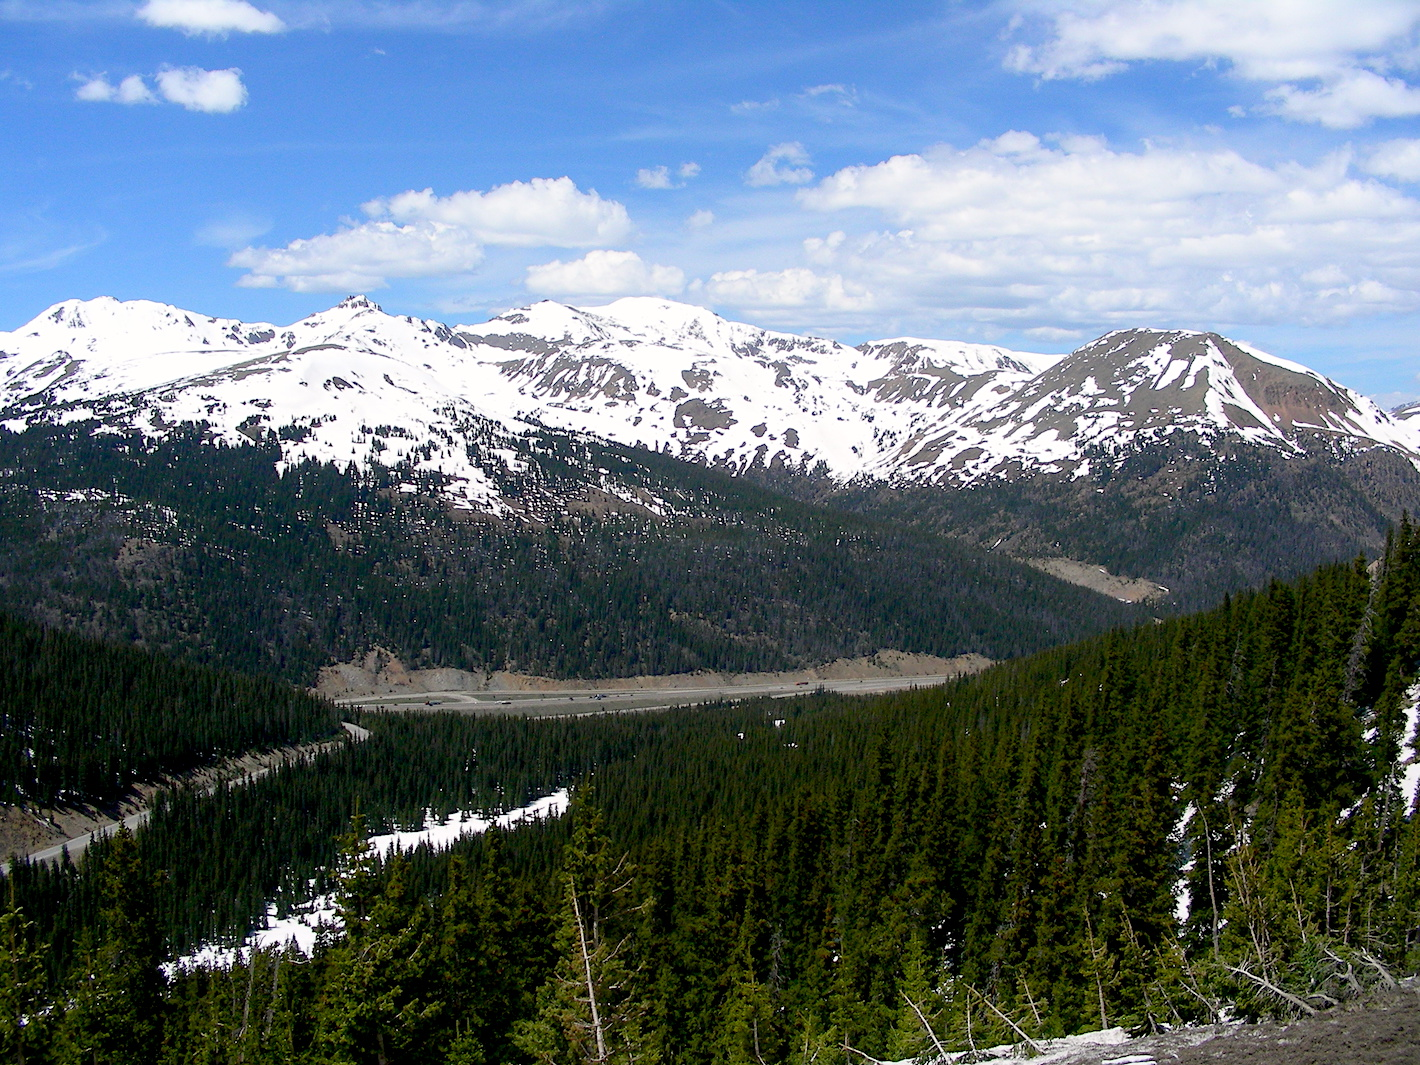 Loveland Pass looking north on June 4.